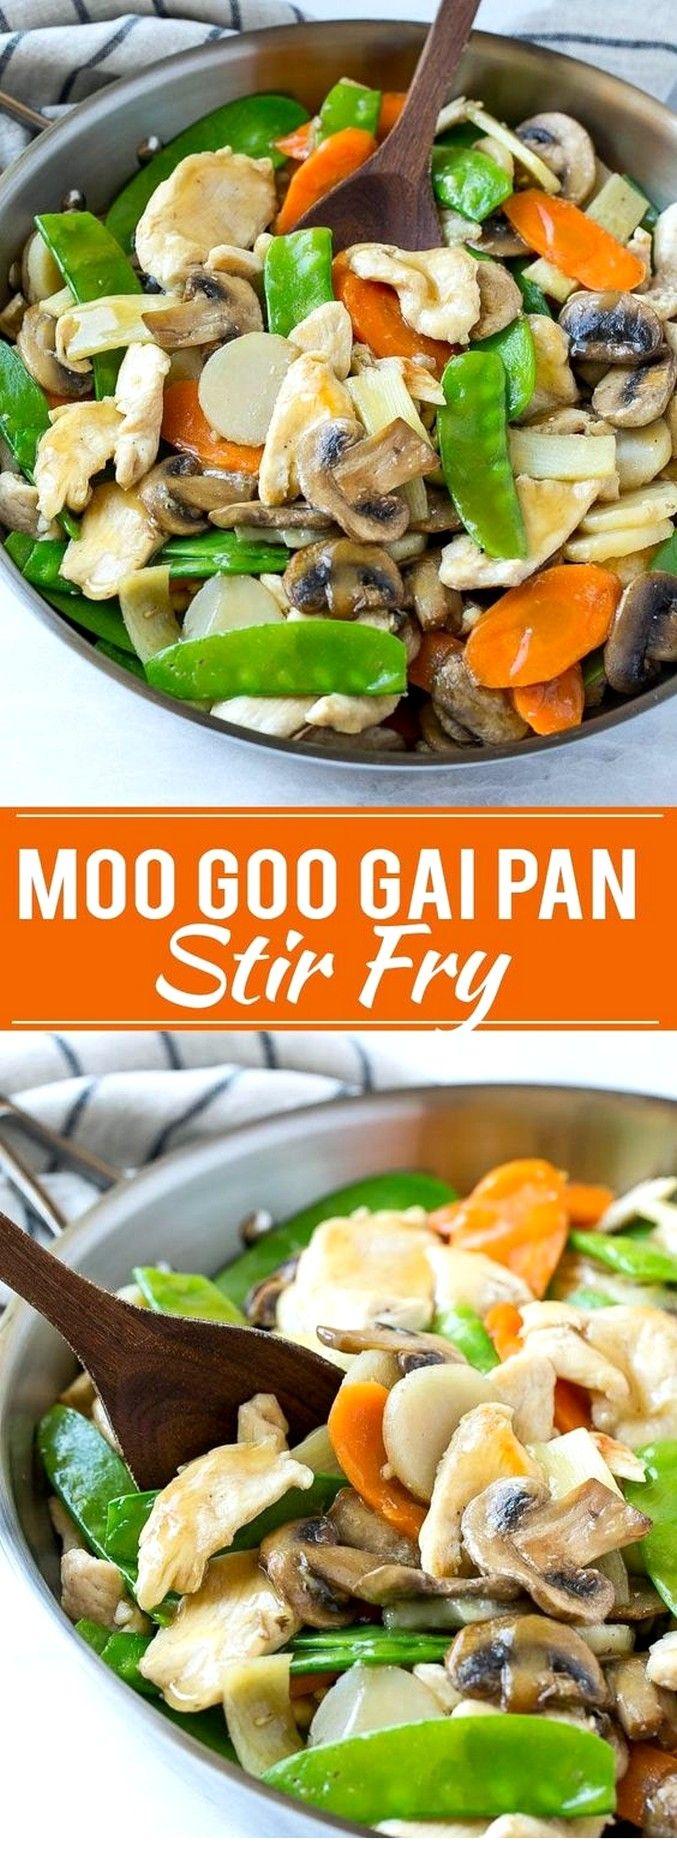 Photo of Moo Goo Gai Pan